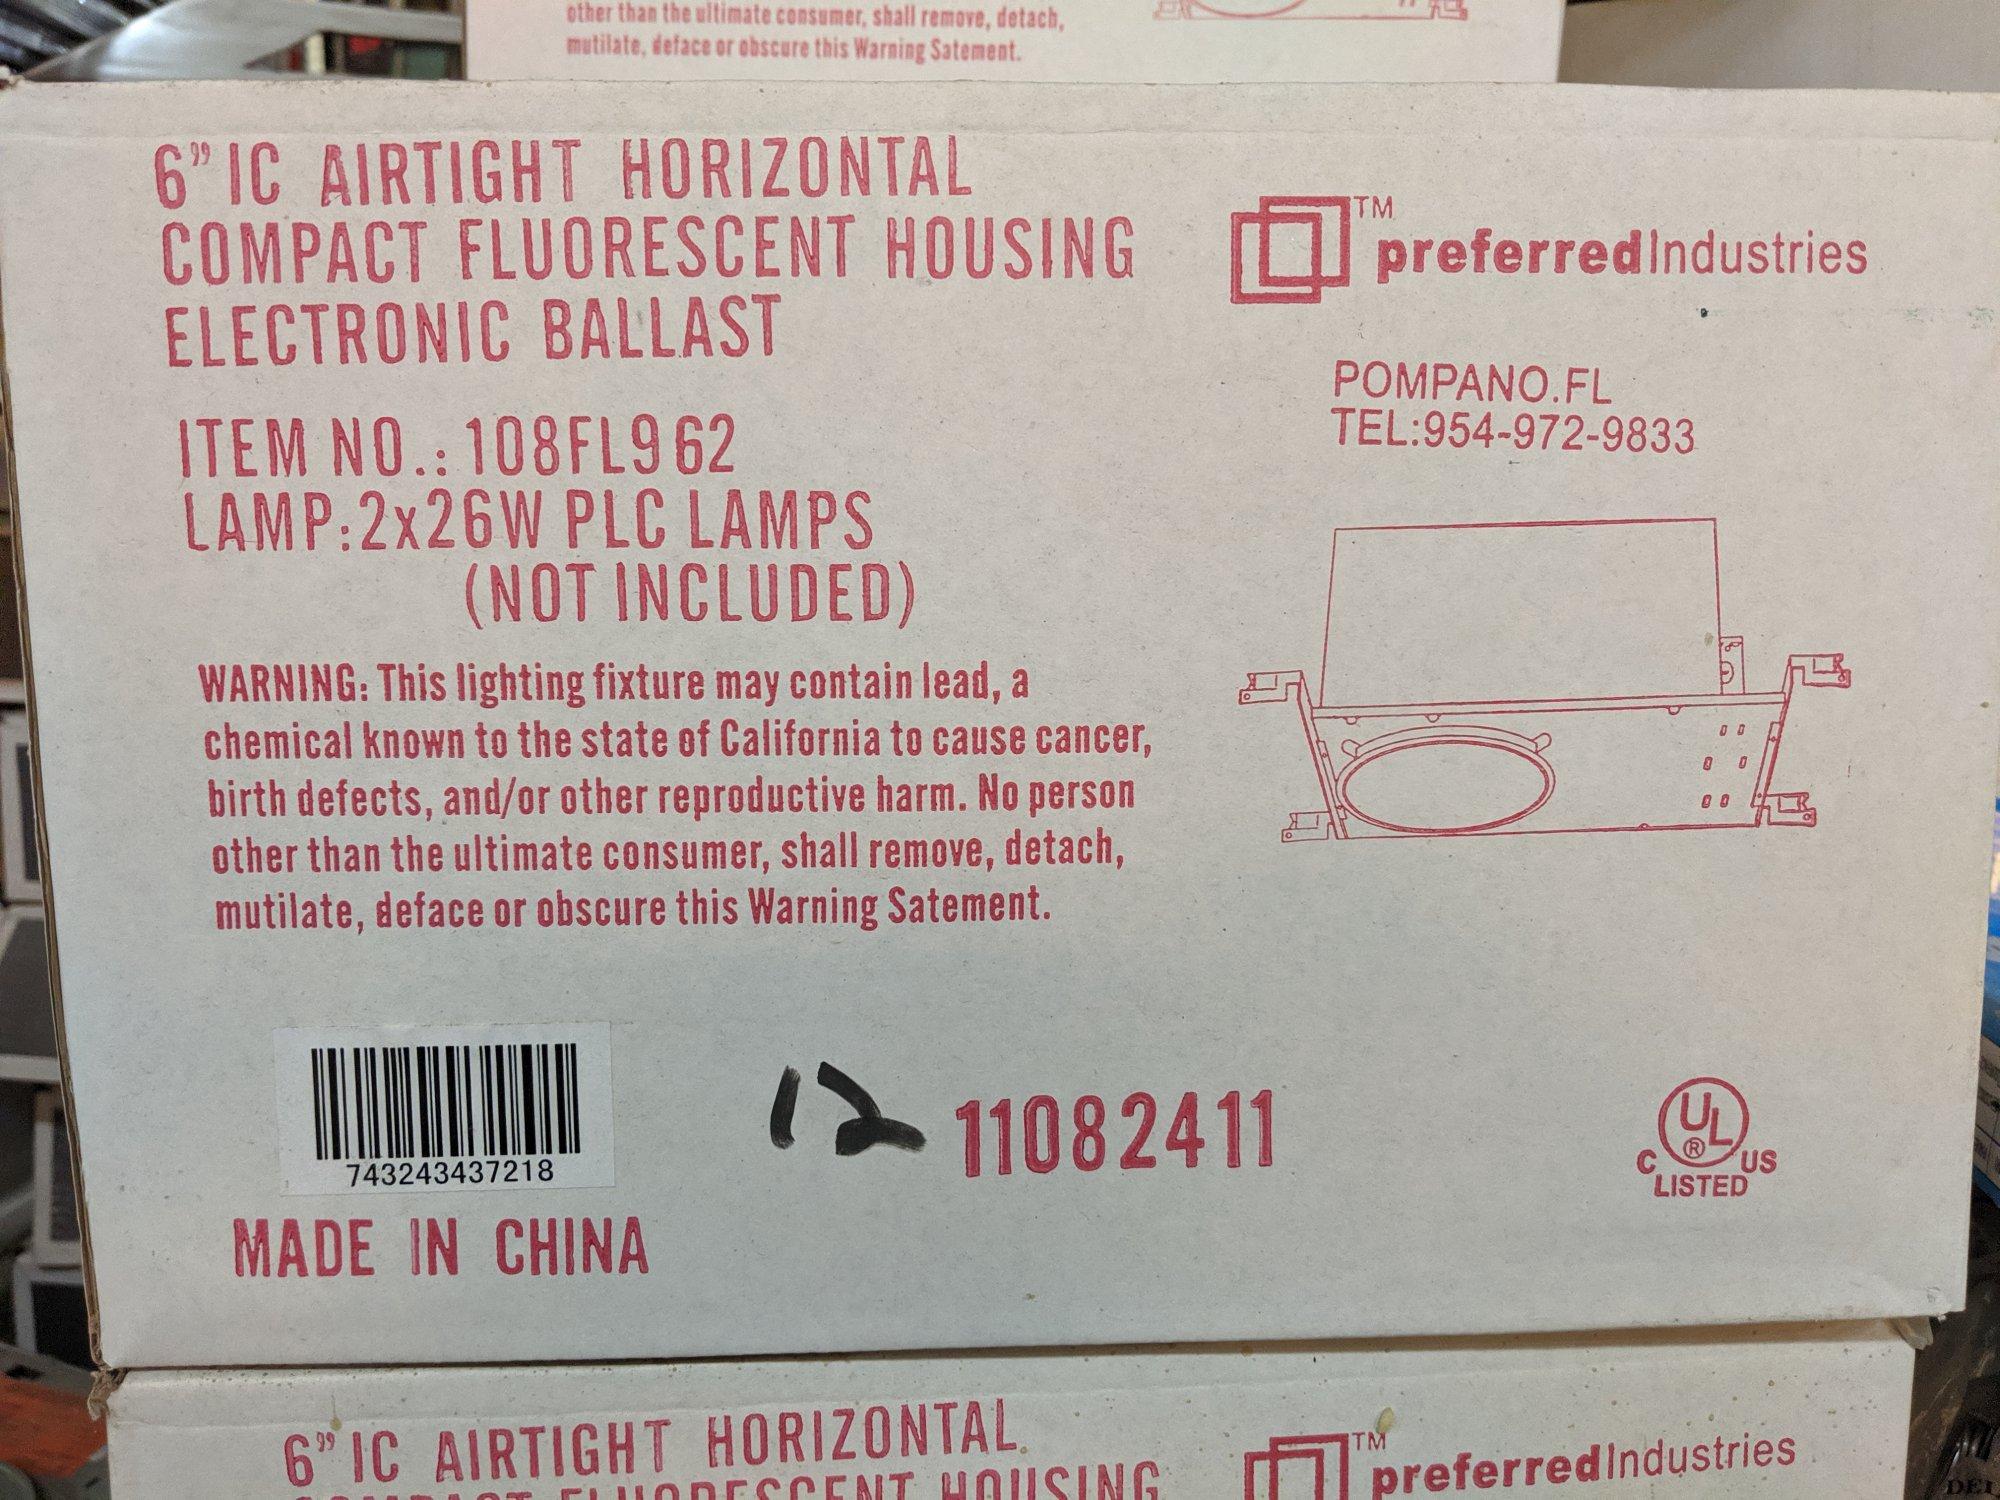 6 IC AIRTIGHT HORIZONTAL COMPACT FLUORESCENT HOUSING